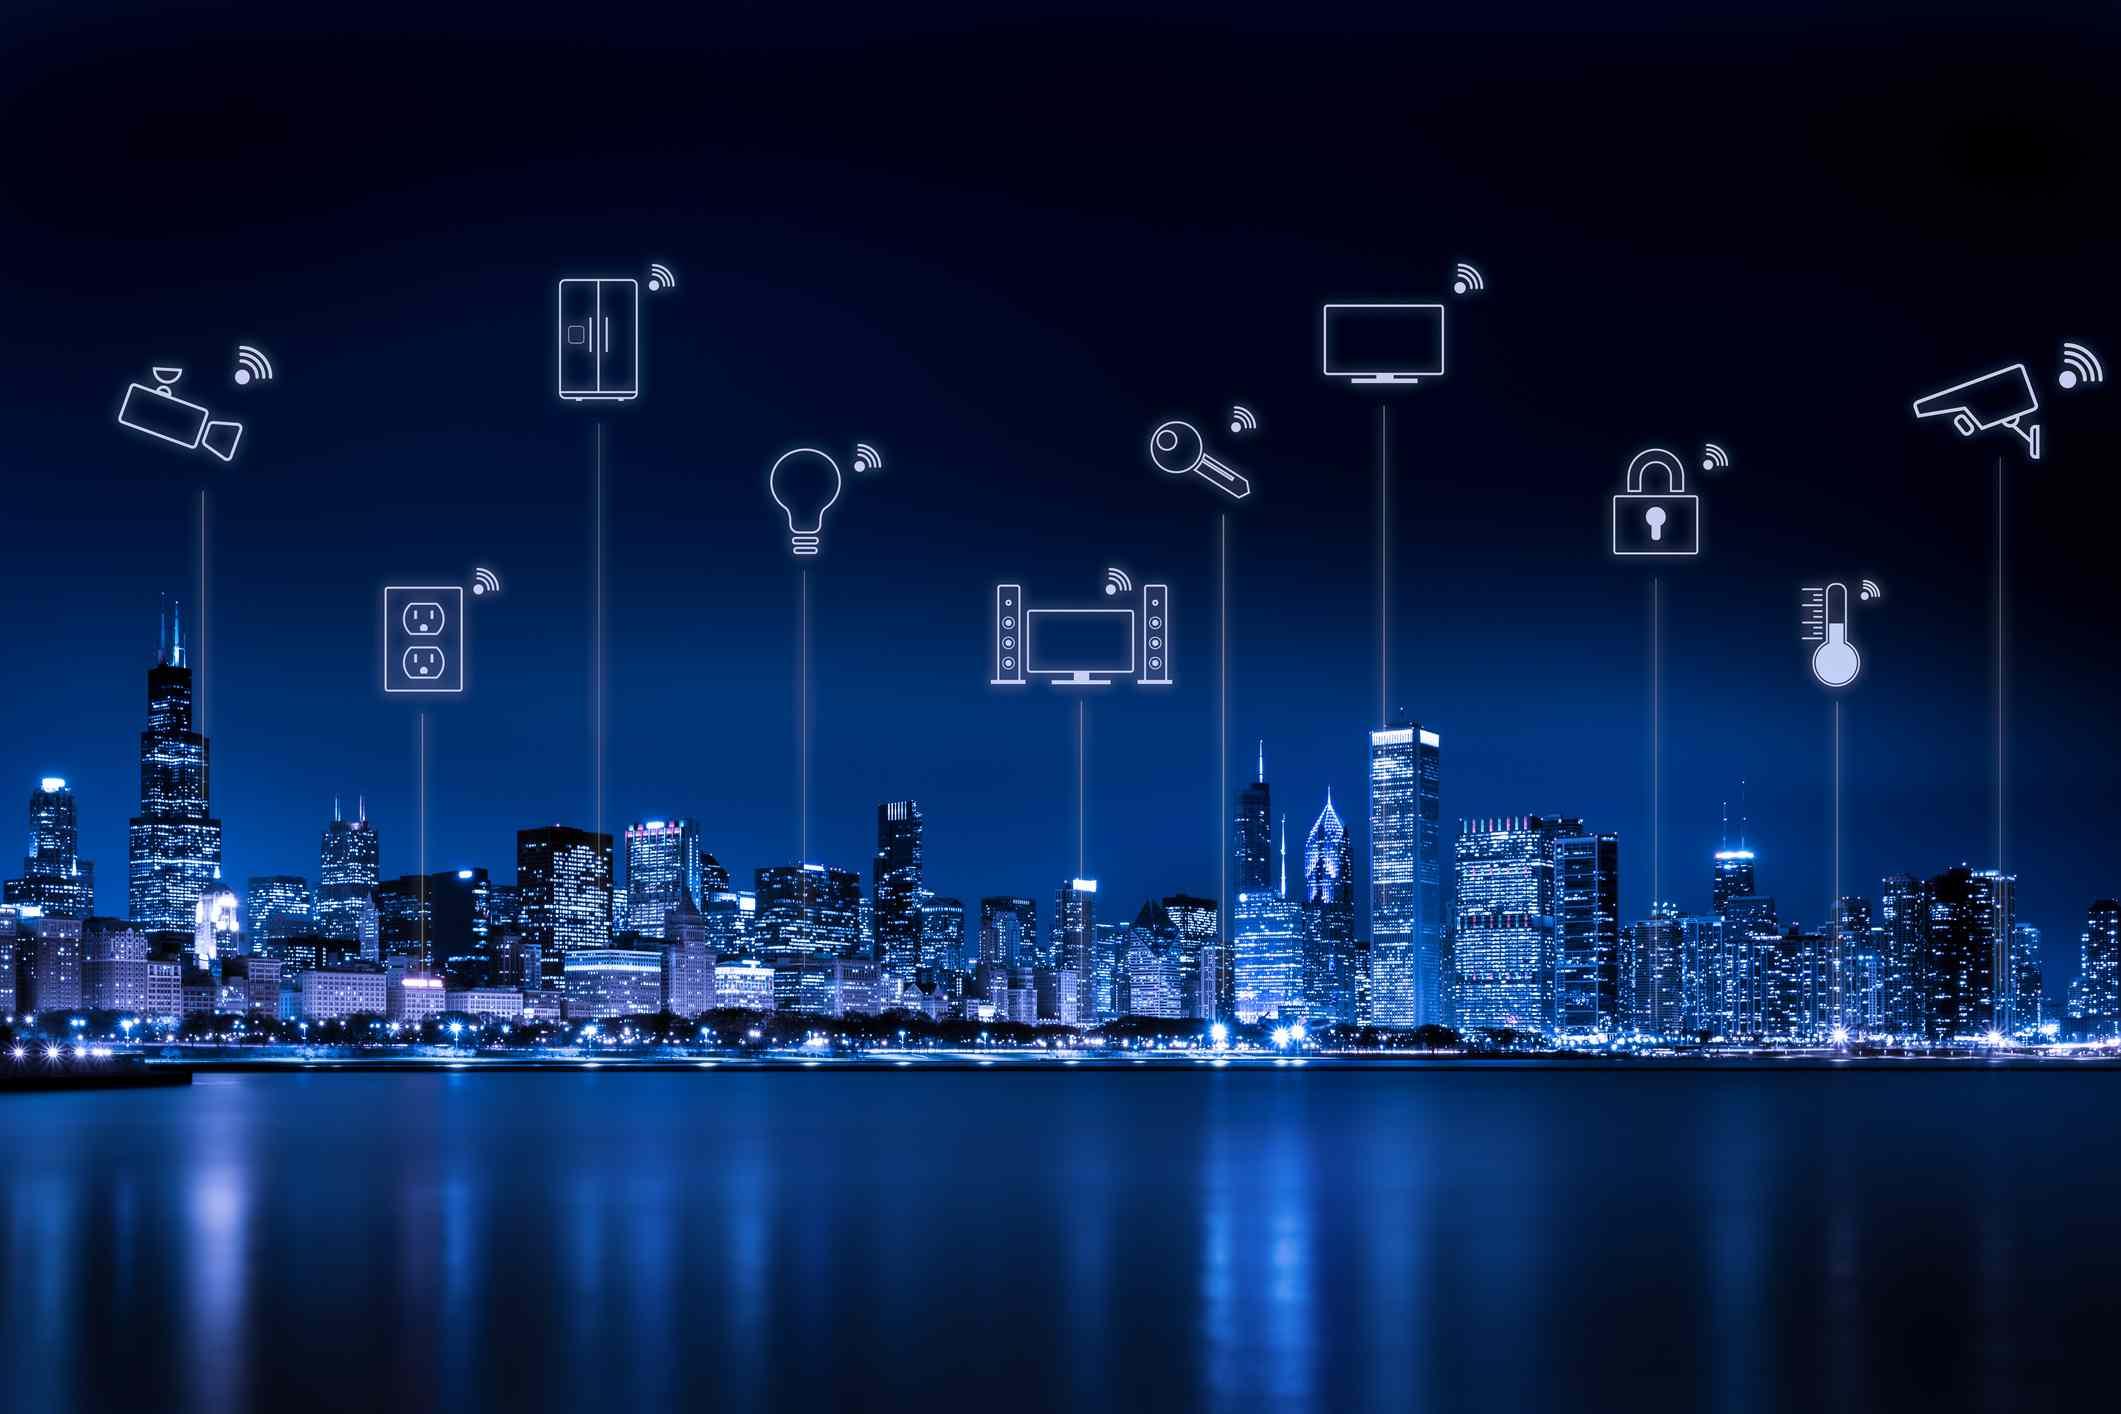 A smart city